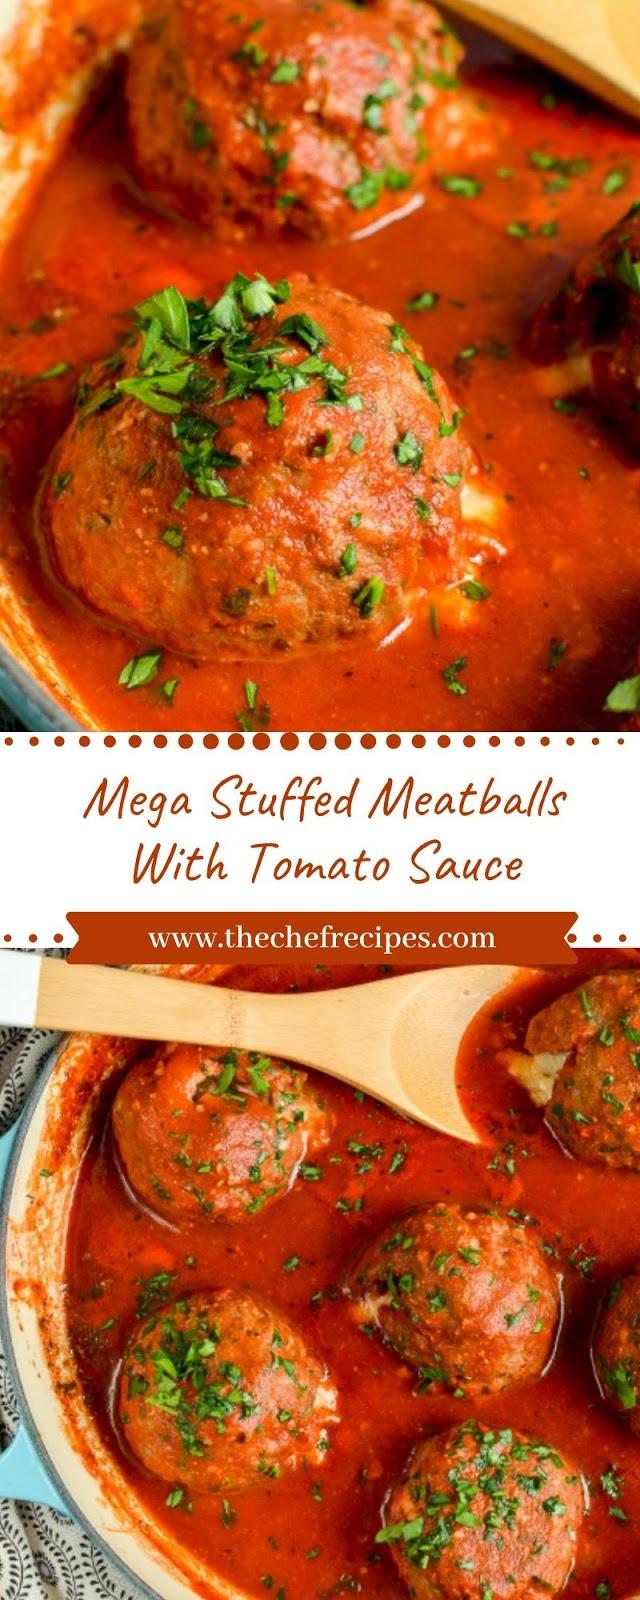 Mega Stuffed Meatballs With Tomato Sauce